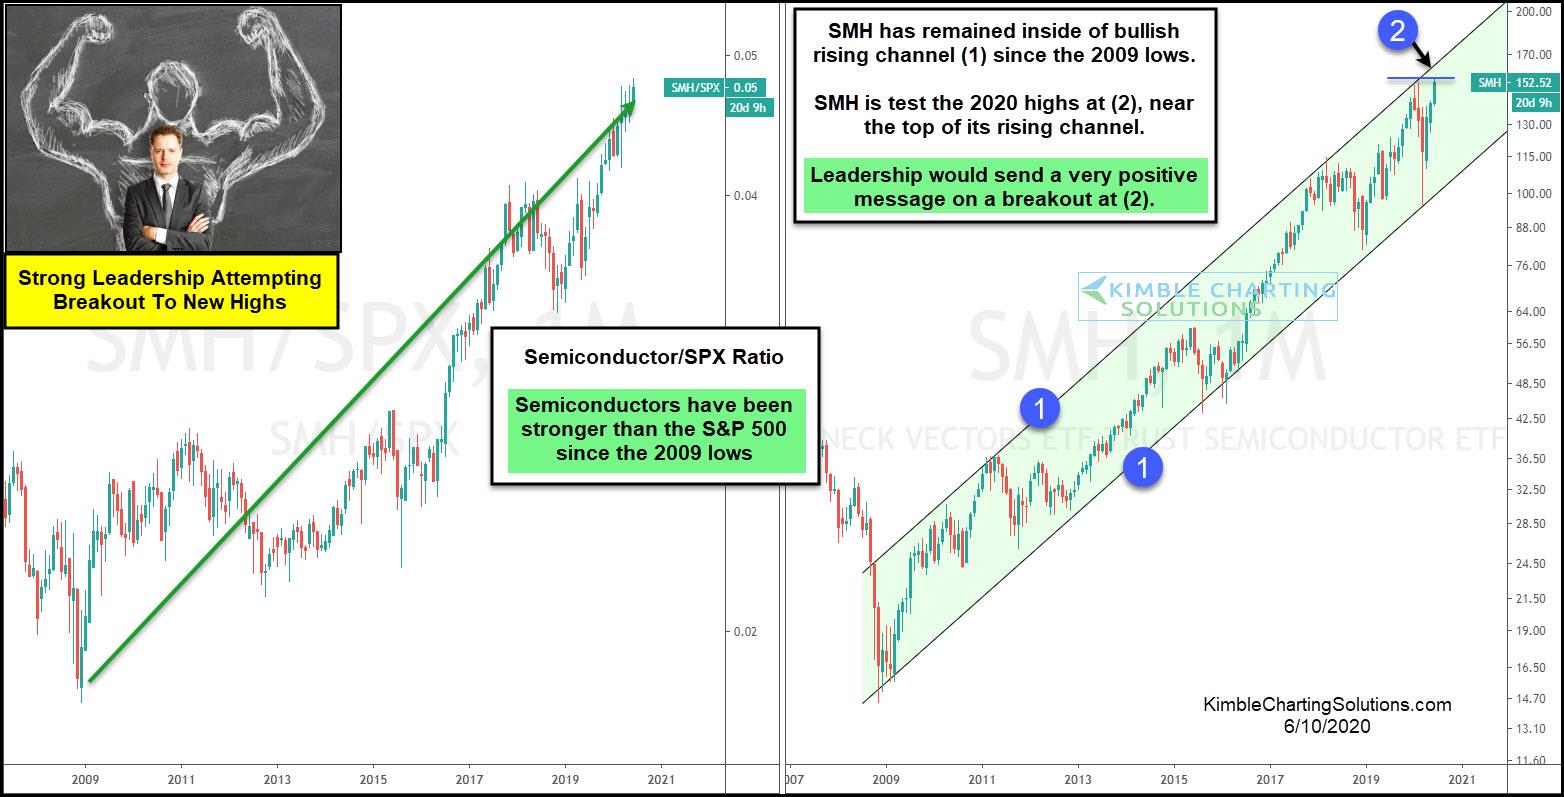 SMH Chart